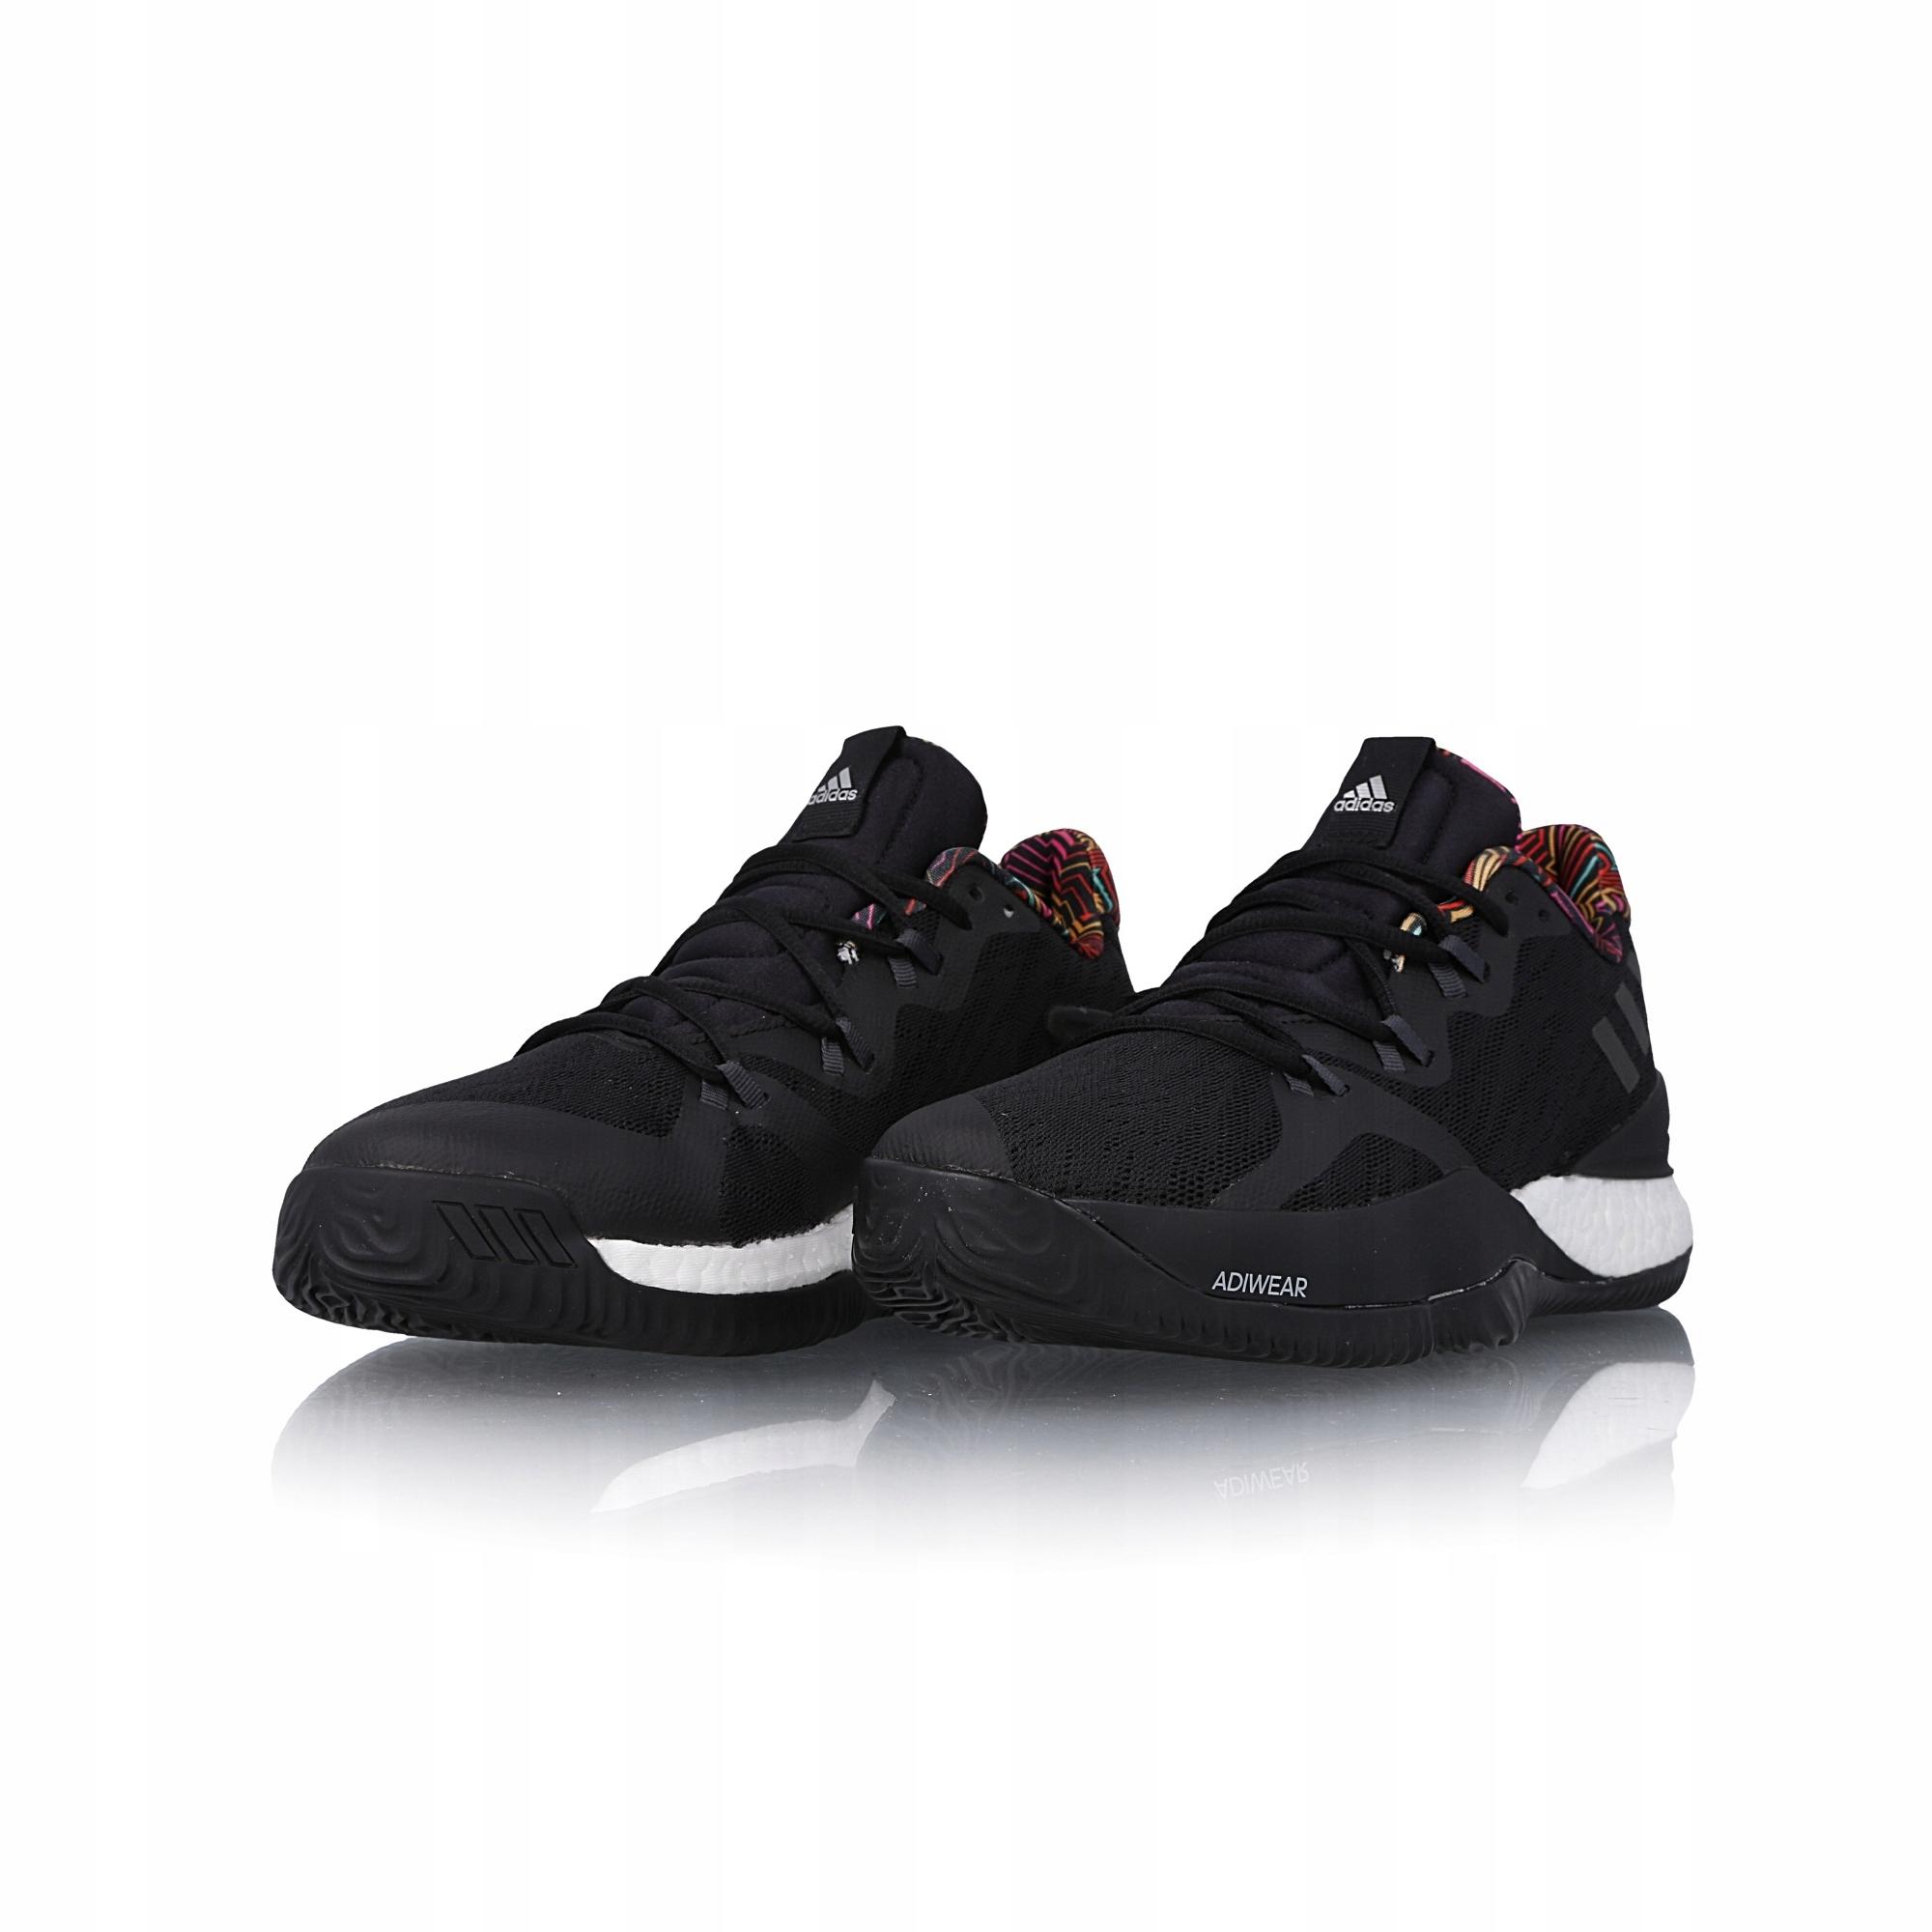 innovative design 0406f 81cd6 Buty męskie adidas Crazylight B43799 42 23 (7568536082)